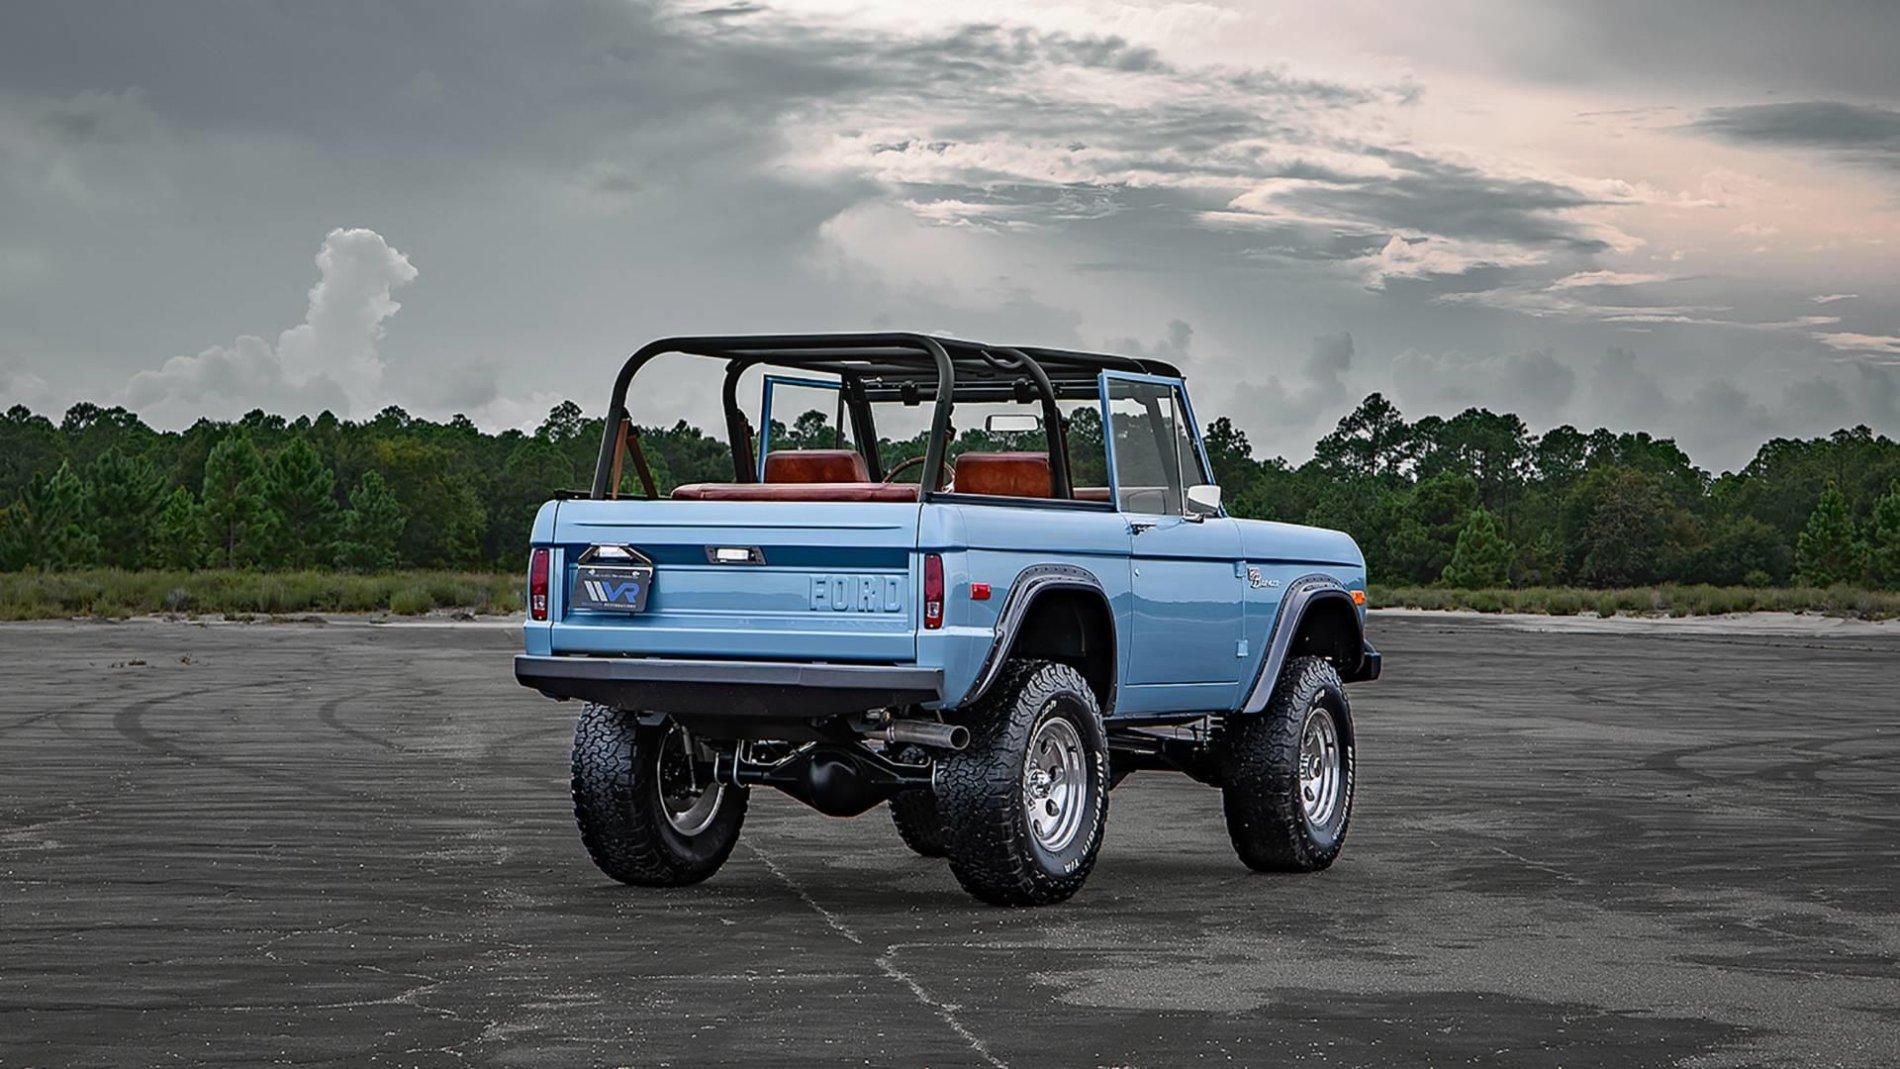 Ford Bronco din 1973 restaurat - Ford Bronco din 1973 restaurat